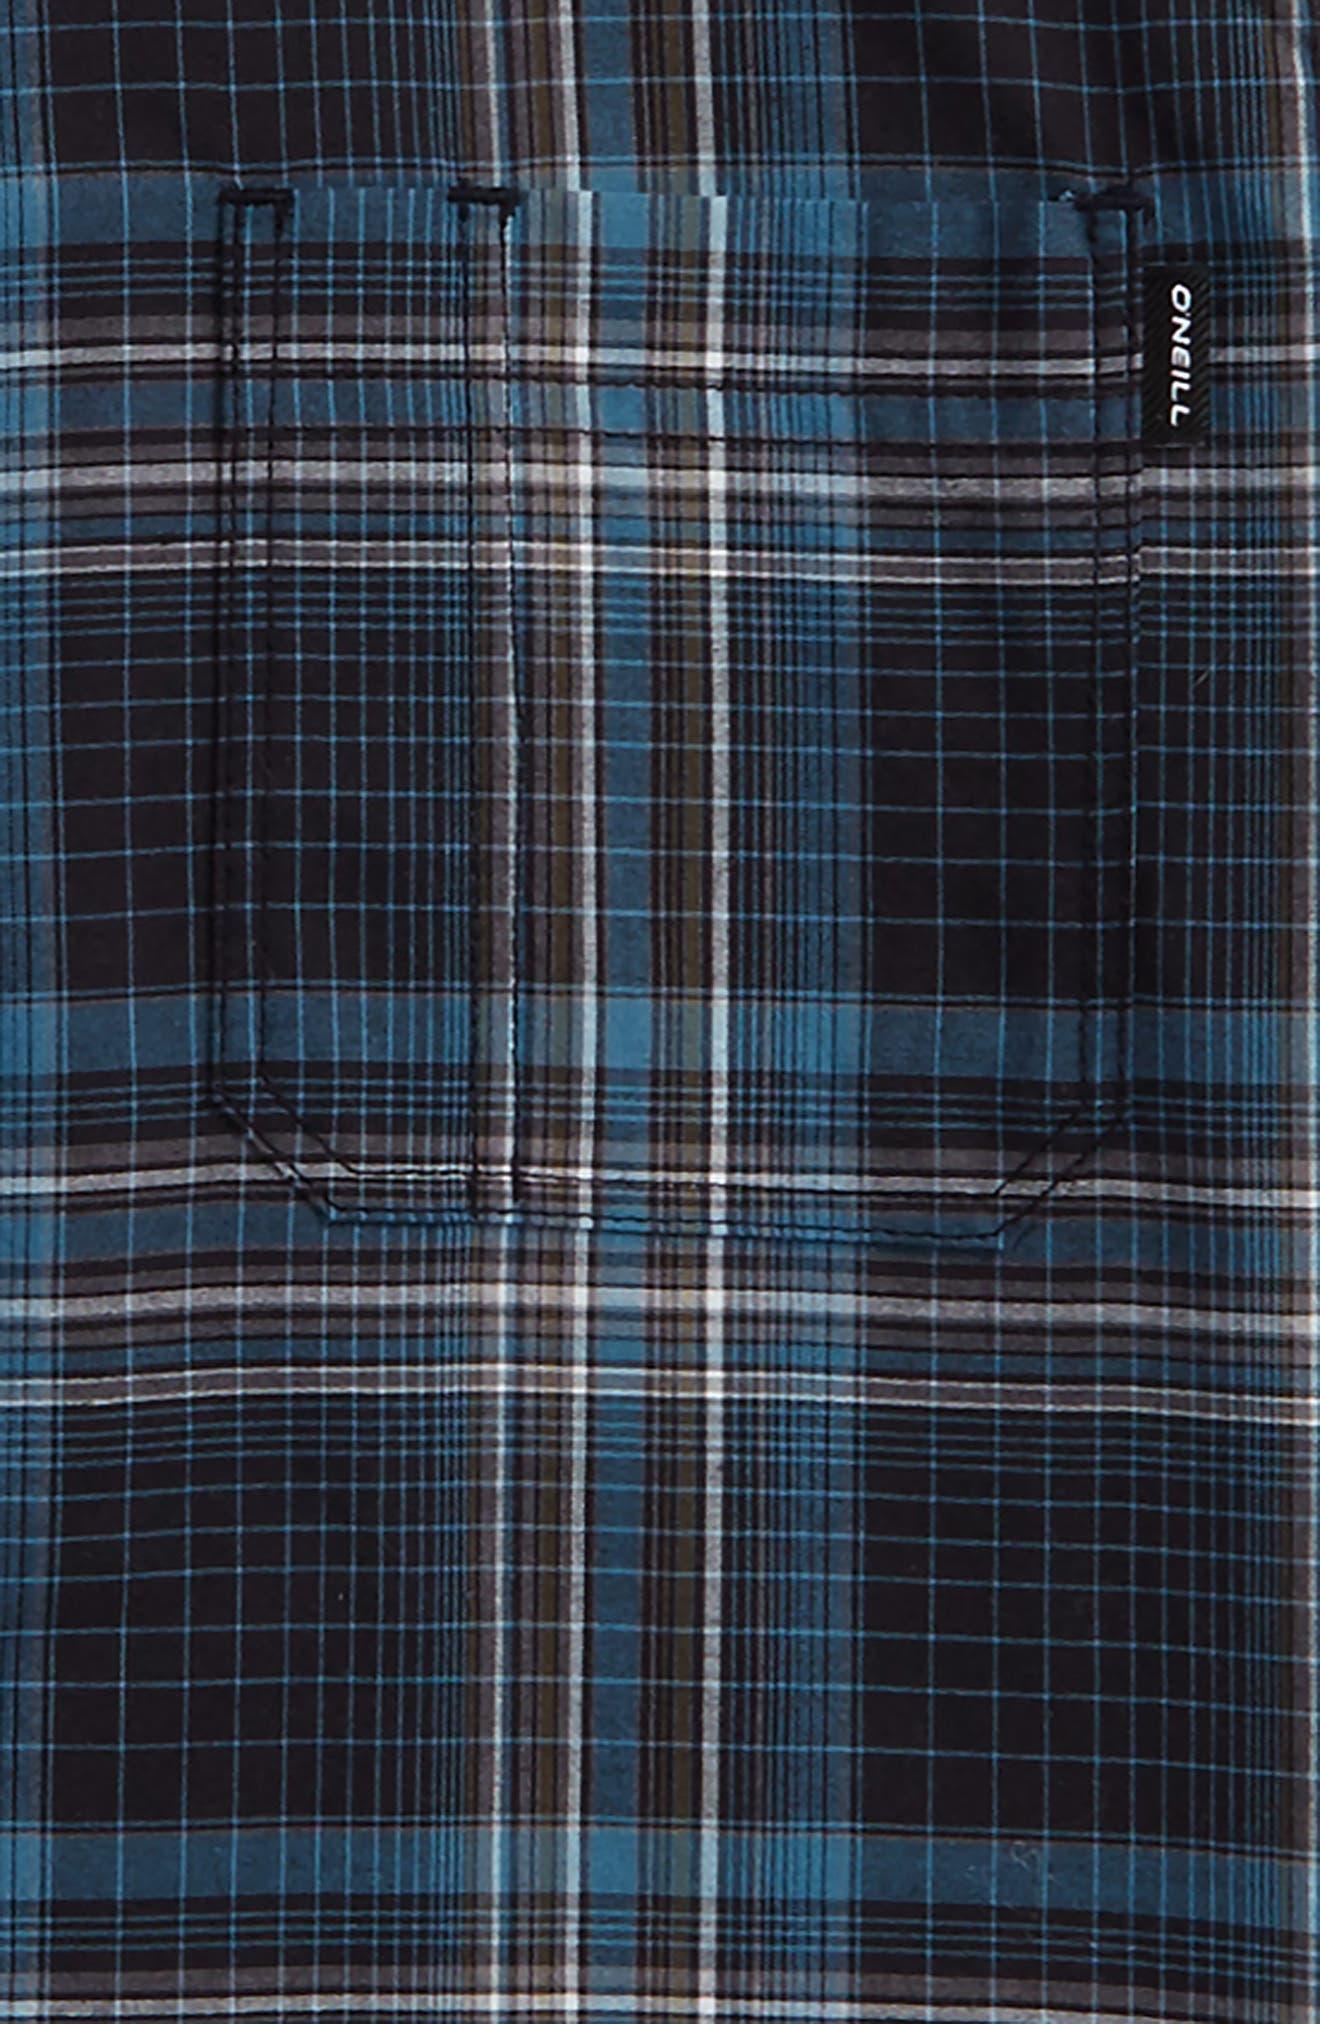 Sturghill Plaid Woven Shirt,                             Alternate thumbnail 2, color,                             Dark Navy